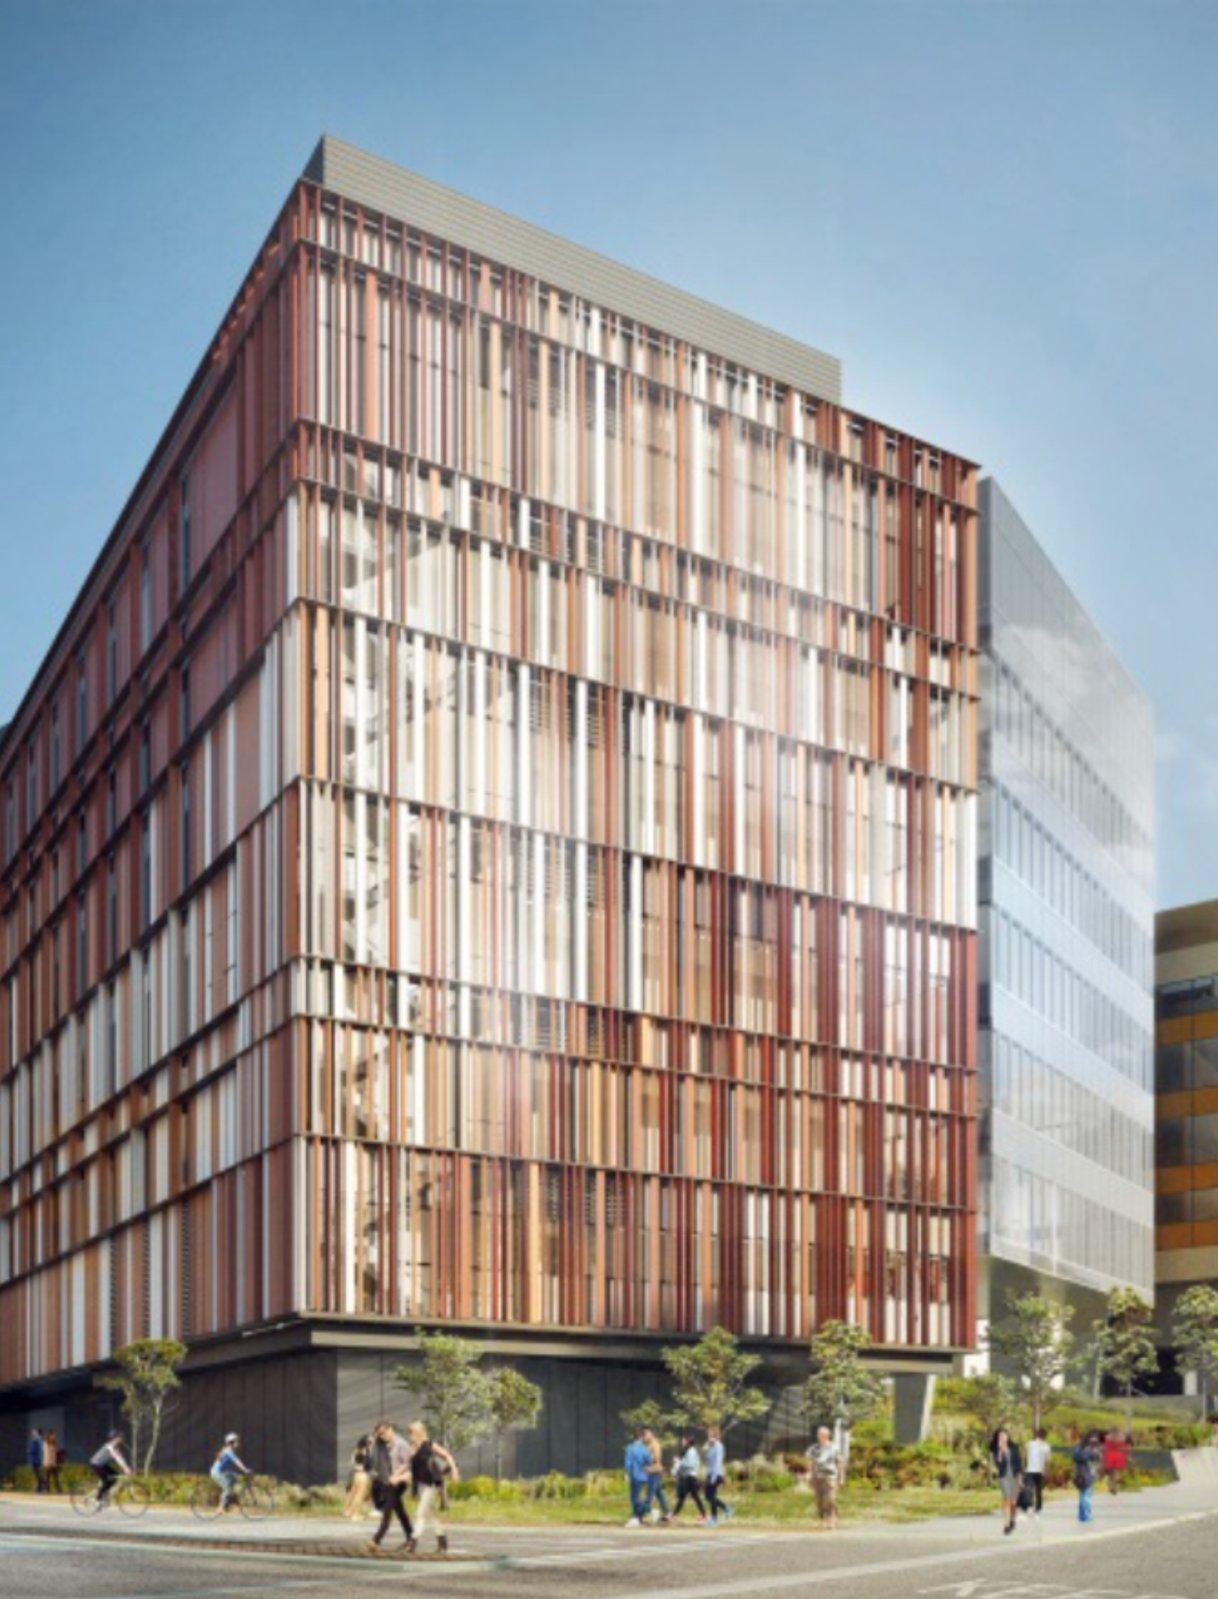 new Biological Sciences building